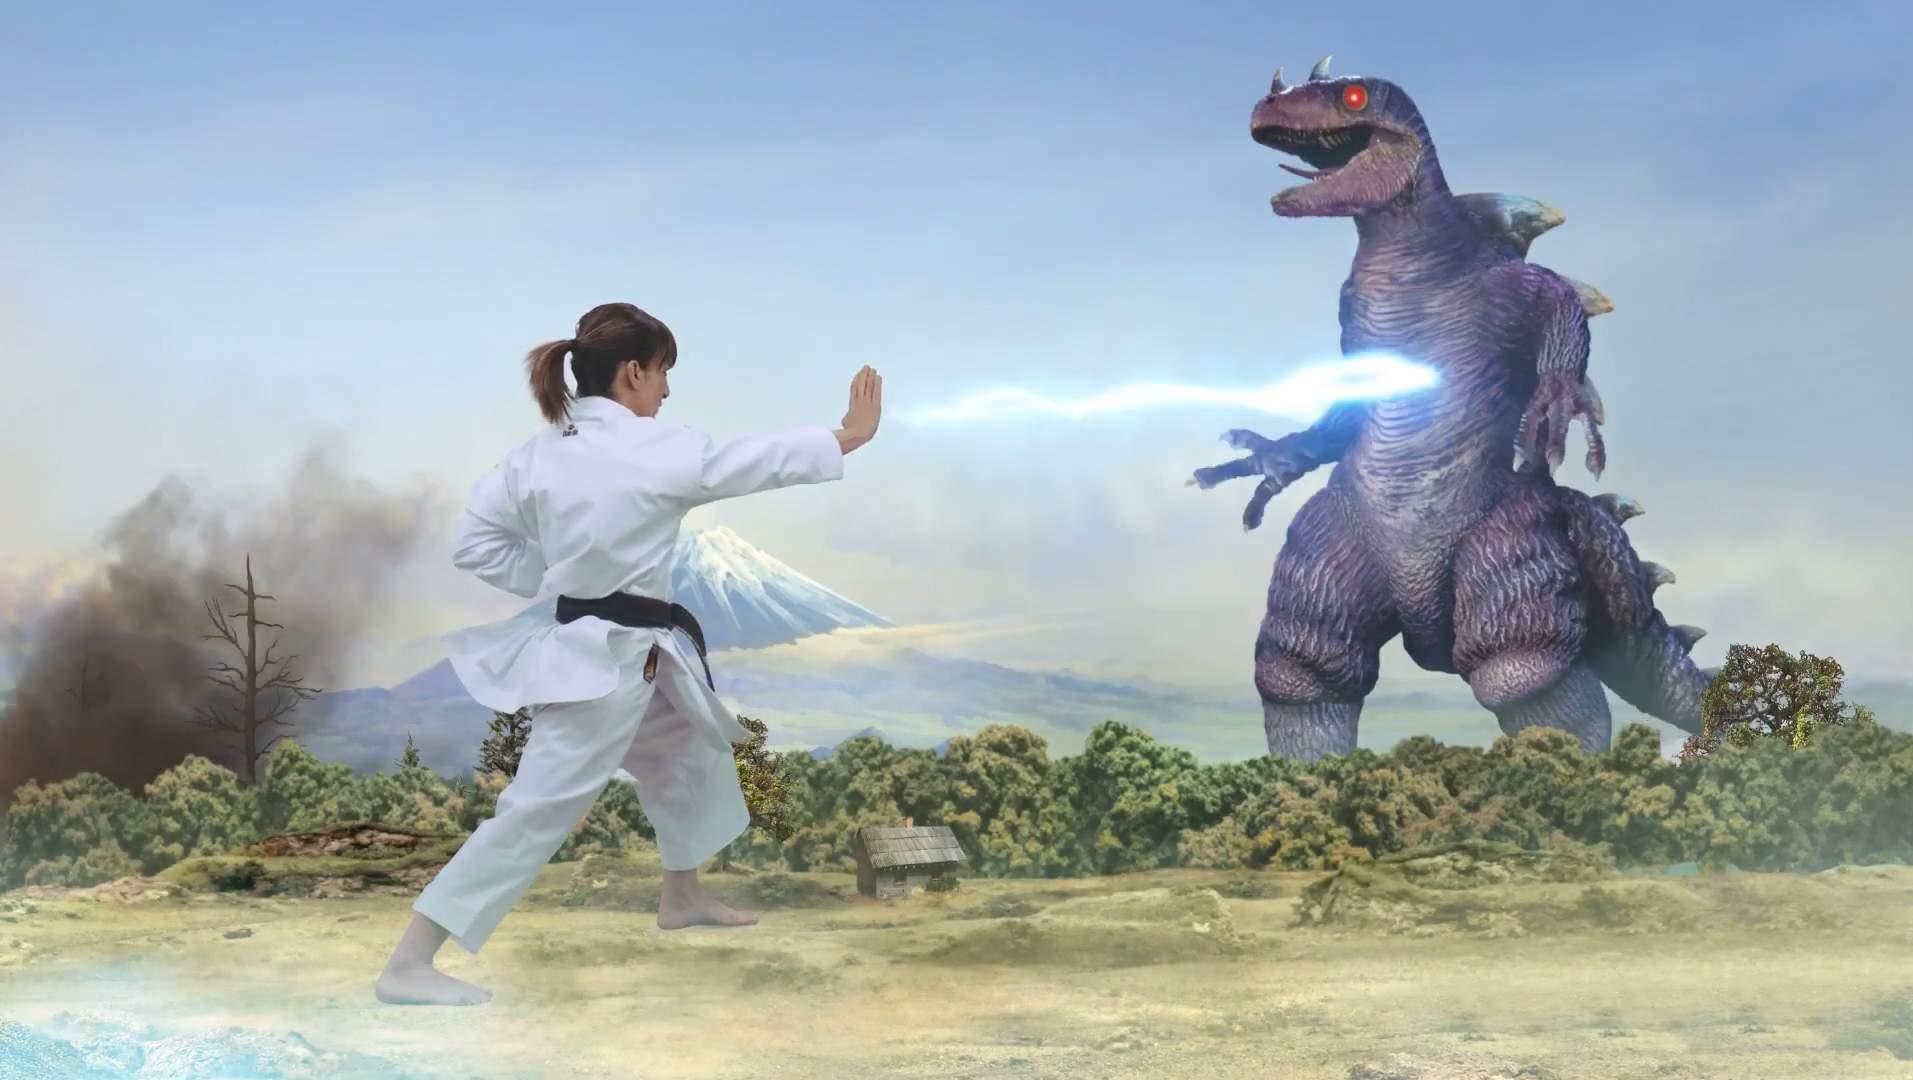 La karateca Sandra Sánchez contra personajes de anime